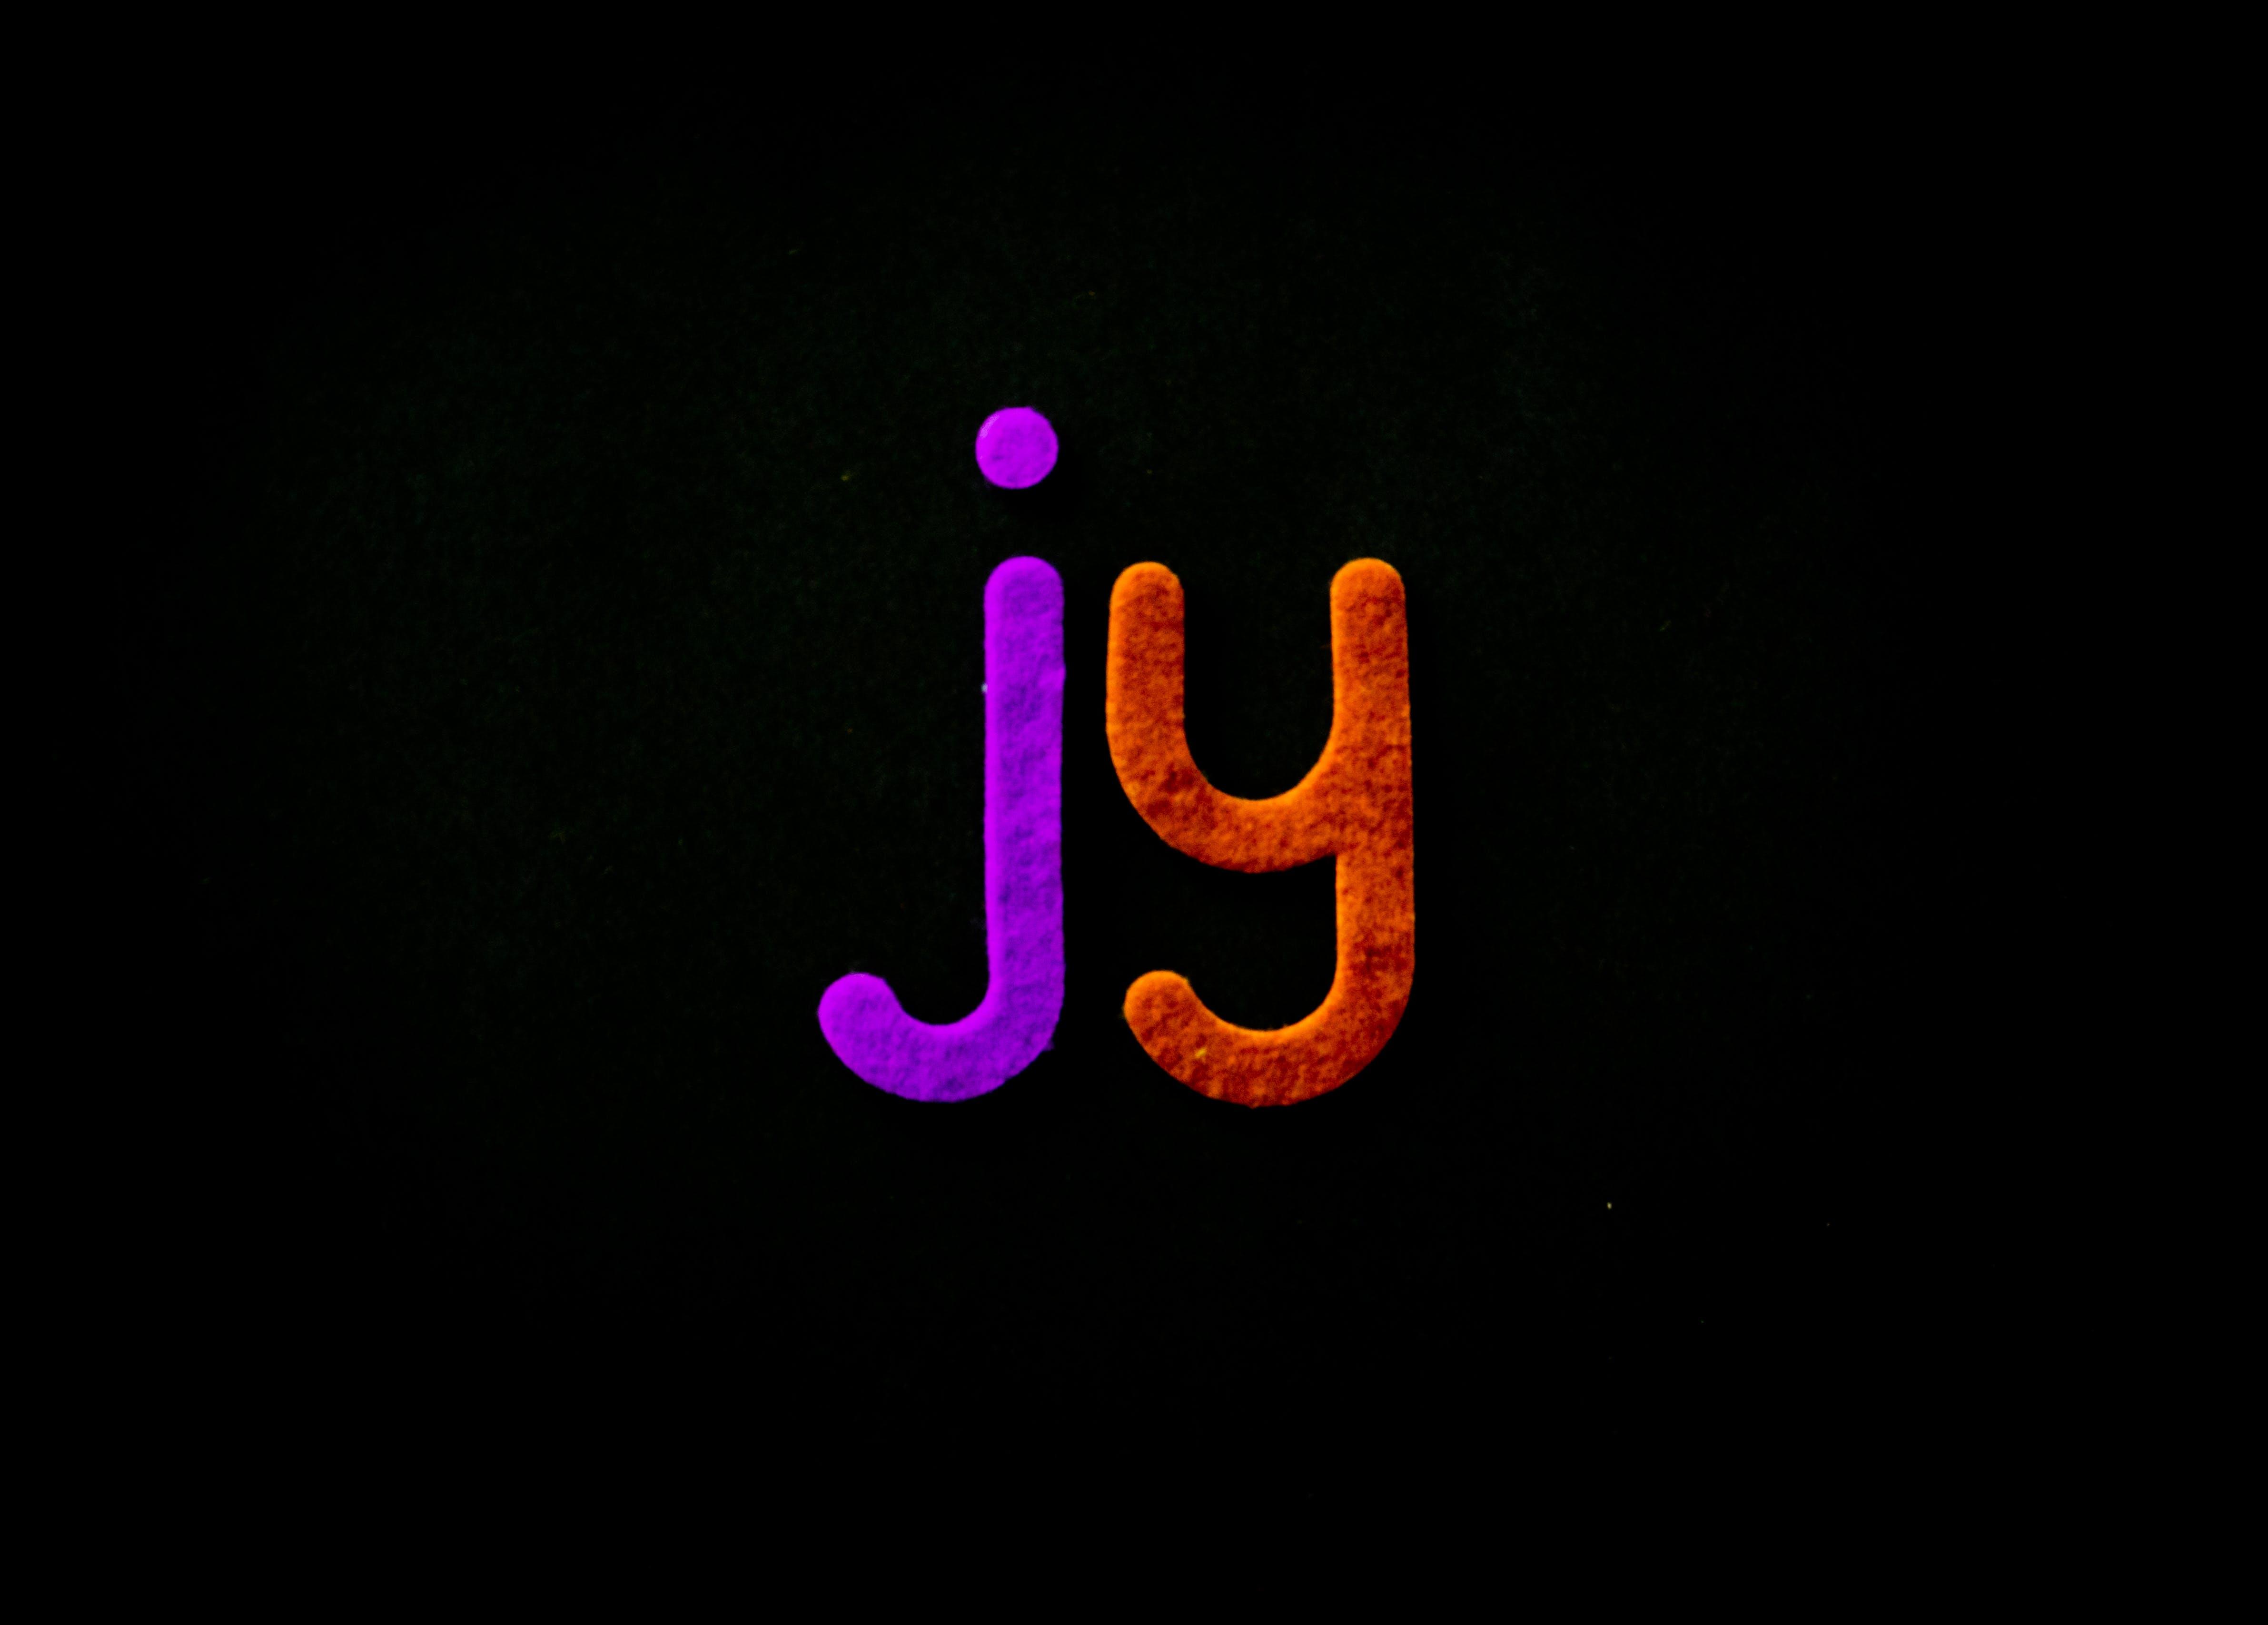 Photo of Jy Logo